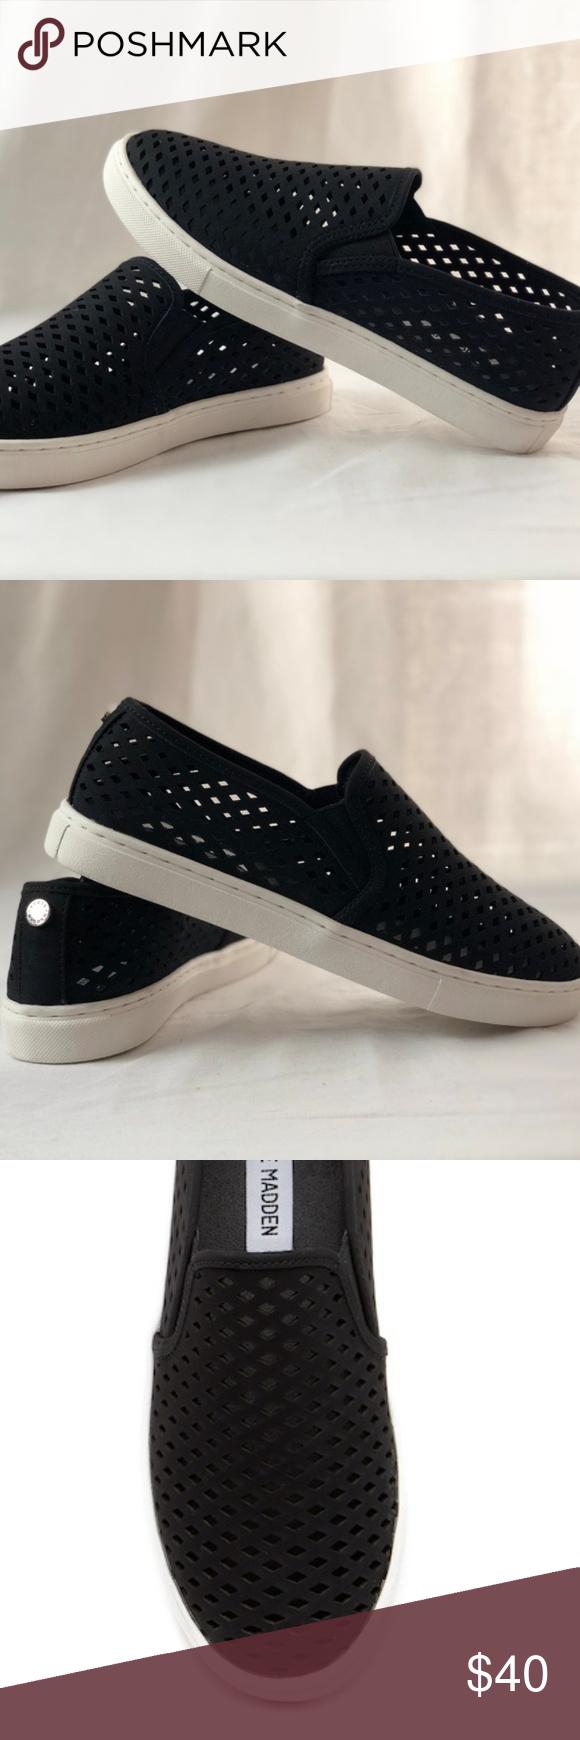 4b1d0c88d37 Steve Madden Zeena Slip-On Sneaker Steve Madden Zeena Slip-On Sneaker.  Condition  New without box. Size  Women s 6.5 Details Sizing  Runs small   ...